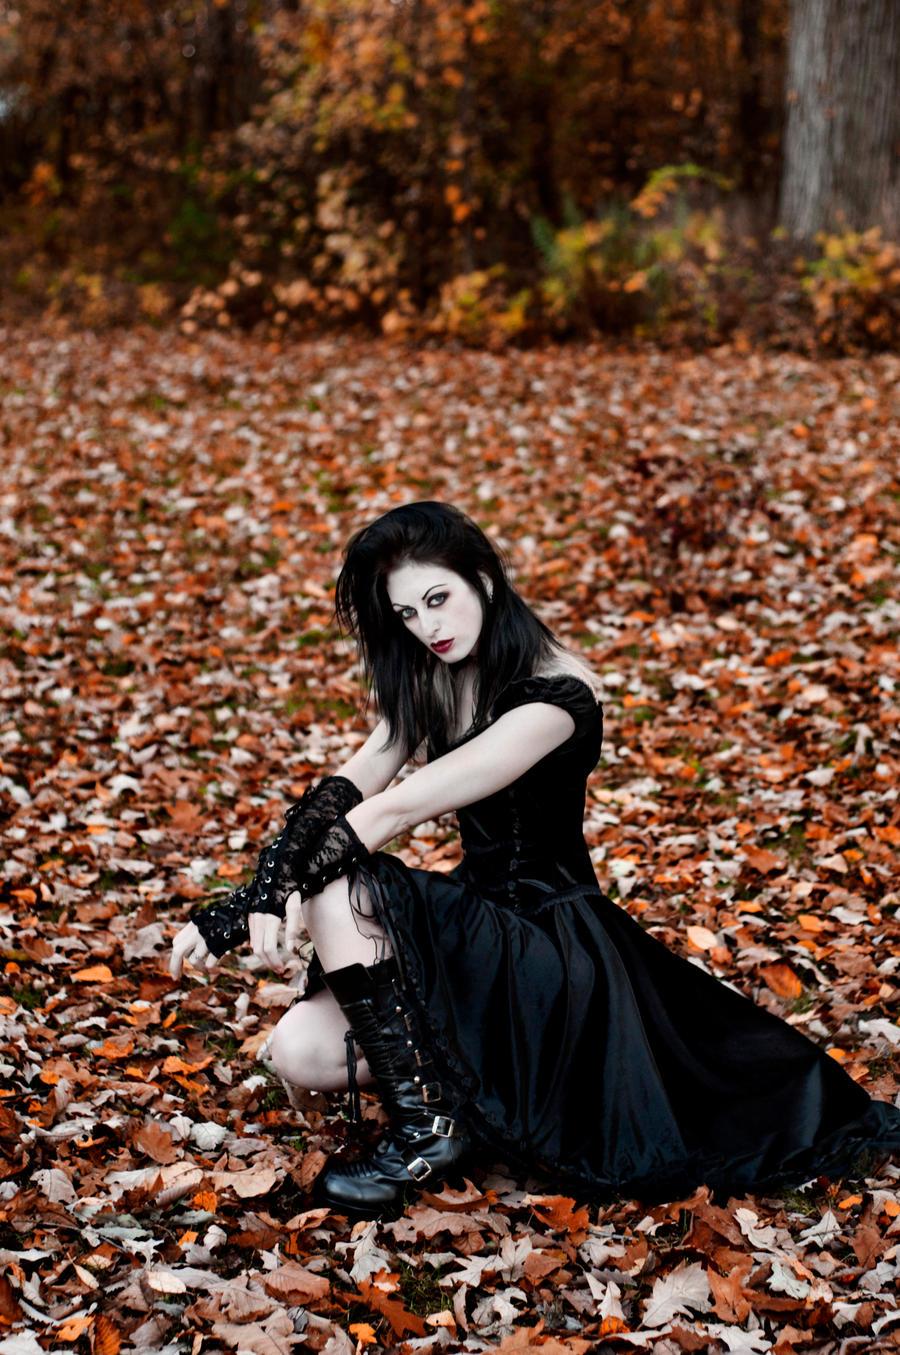 Goth Girl Stock 03 by MeetMeAtTheLake2Nite